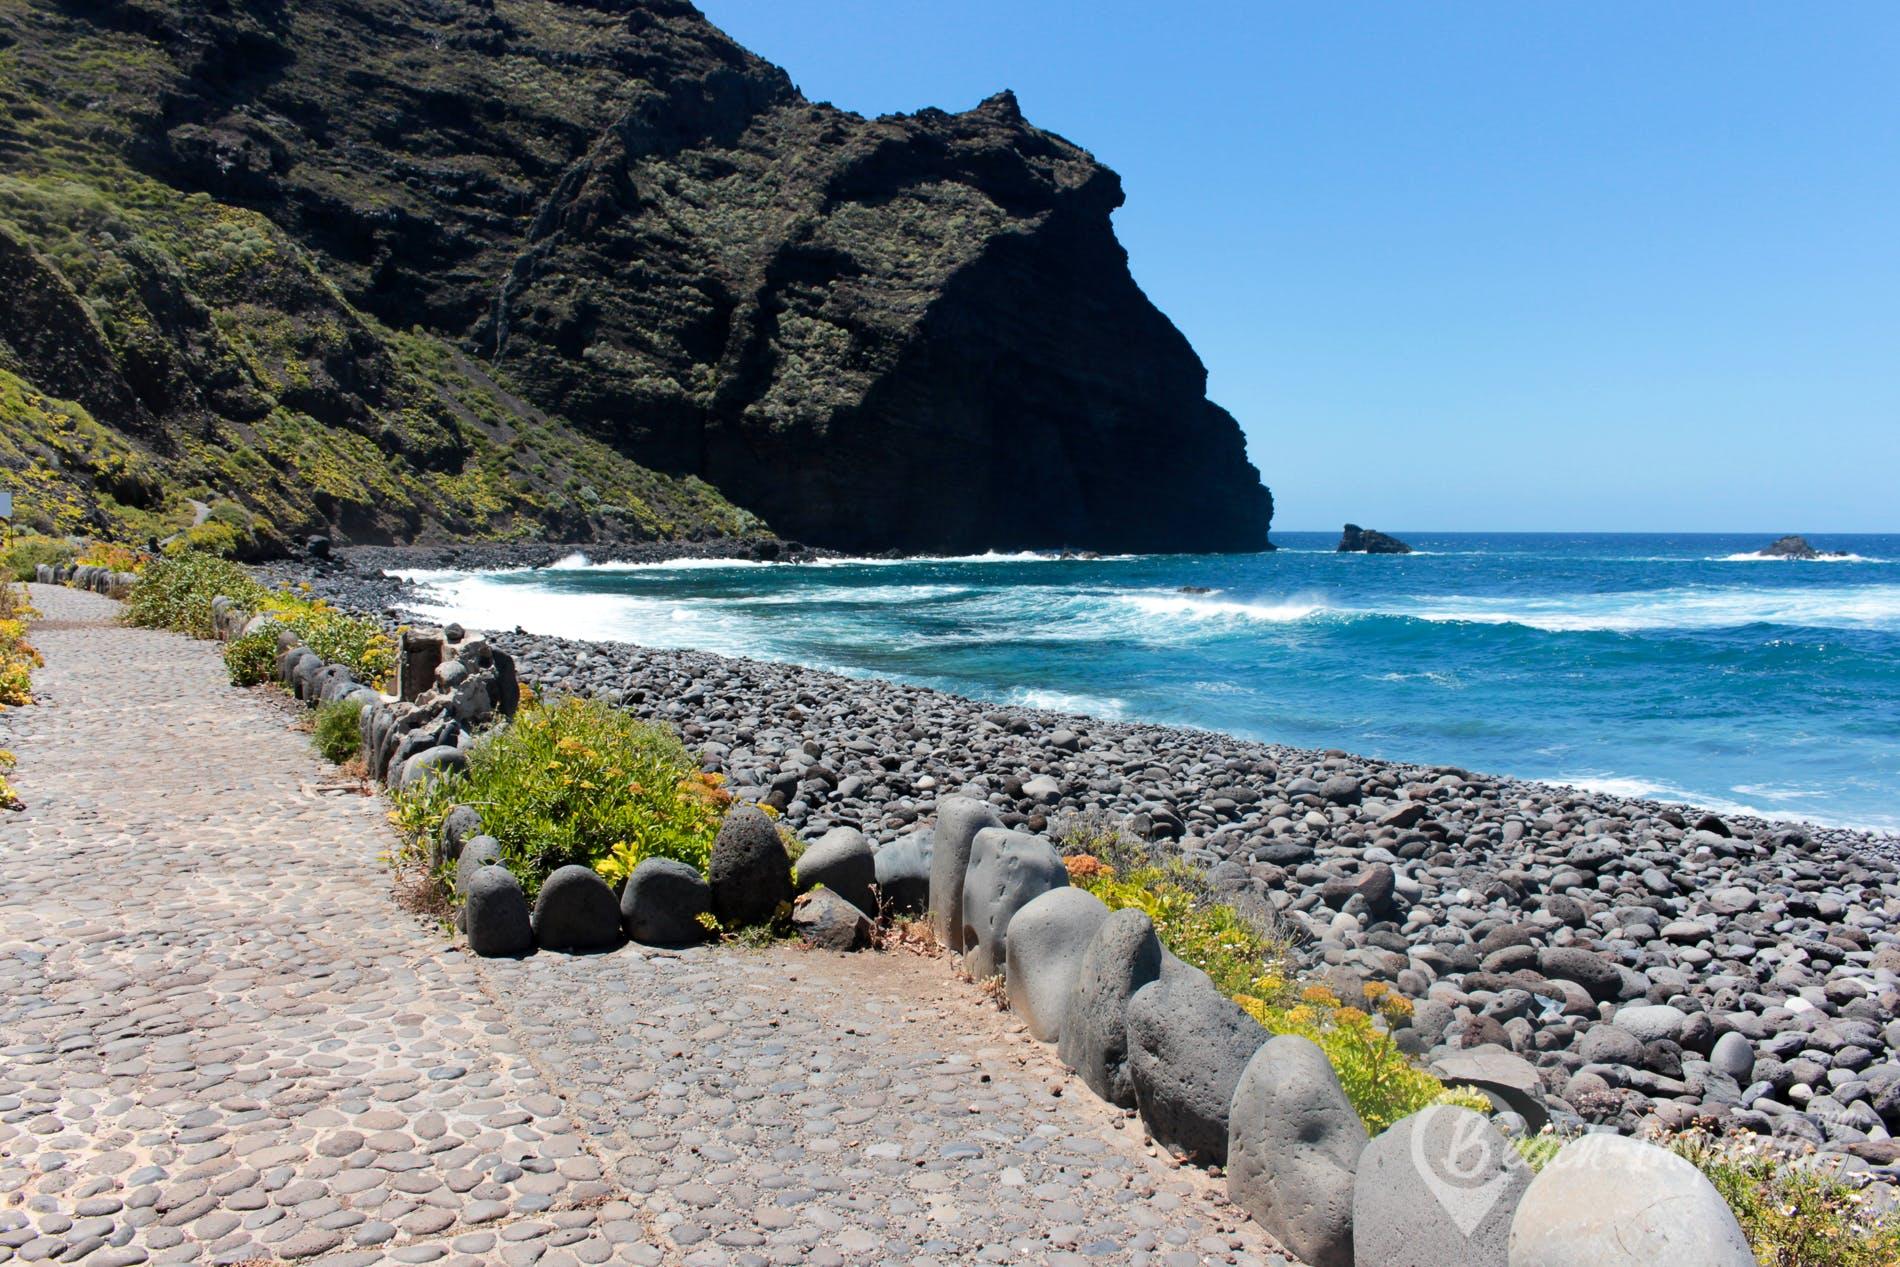 Beach Playa del Fraile, Tenerife, Spain